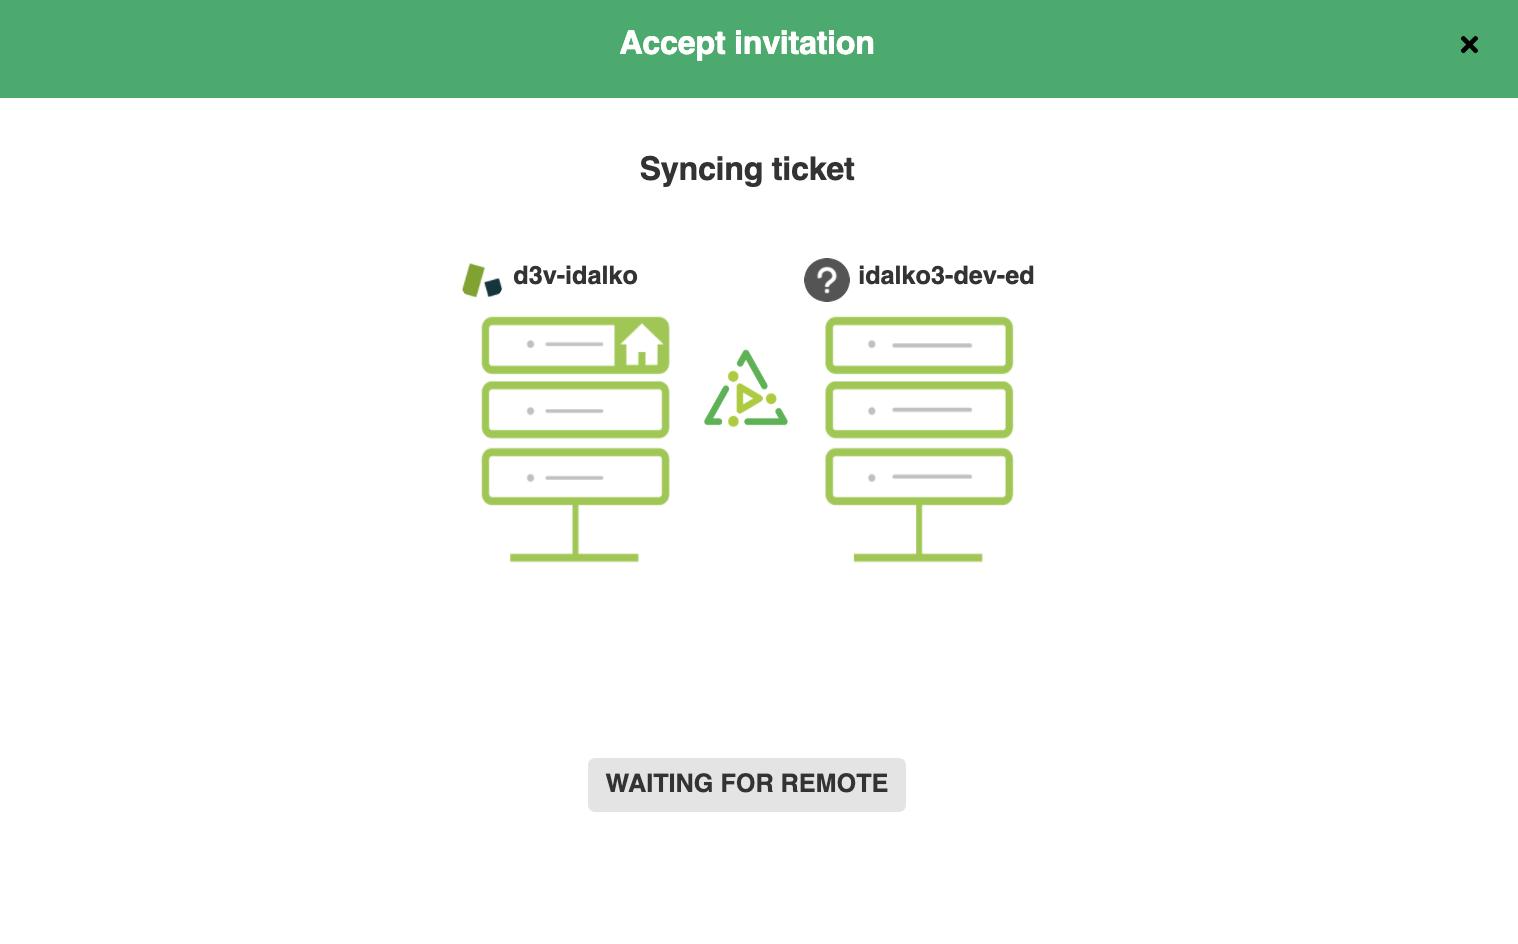 accept salesforce Zendesk sync invitation